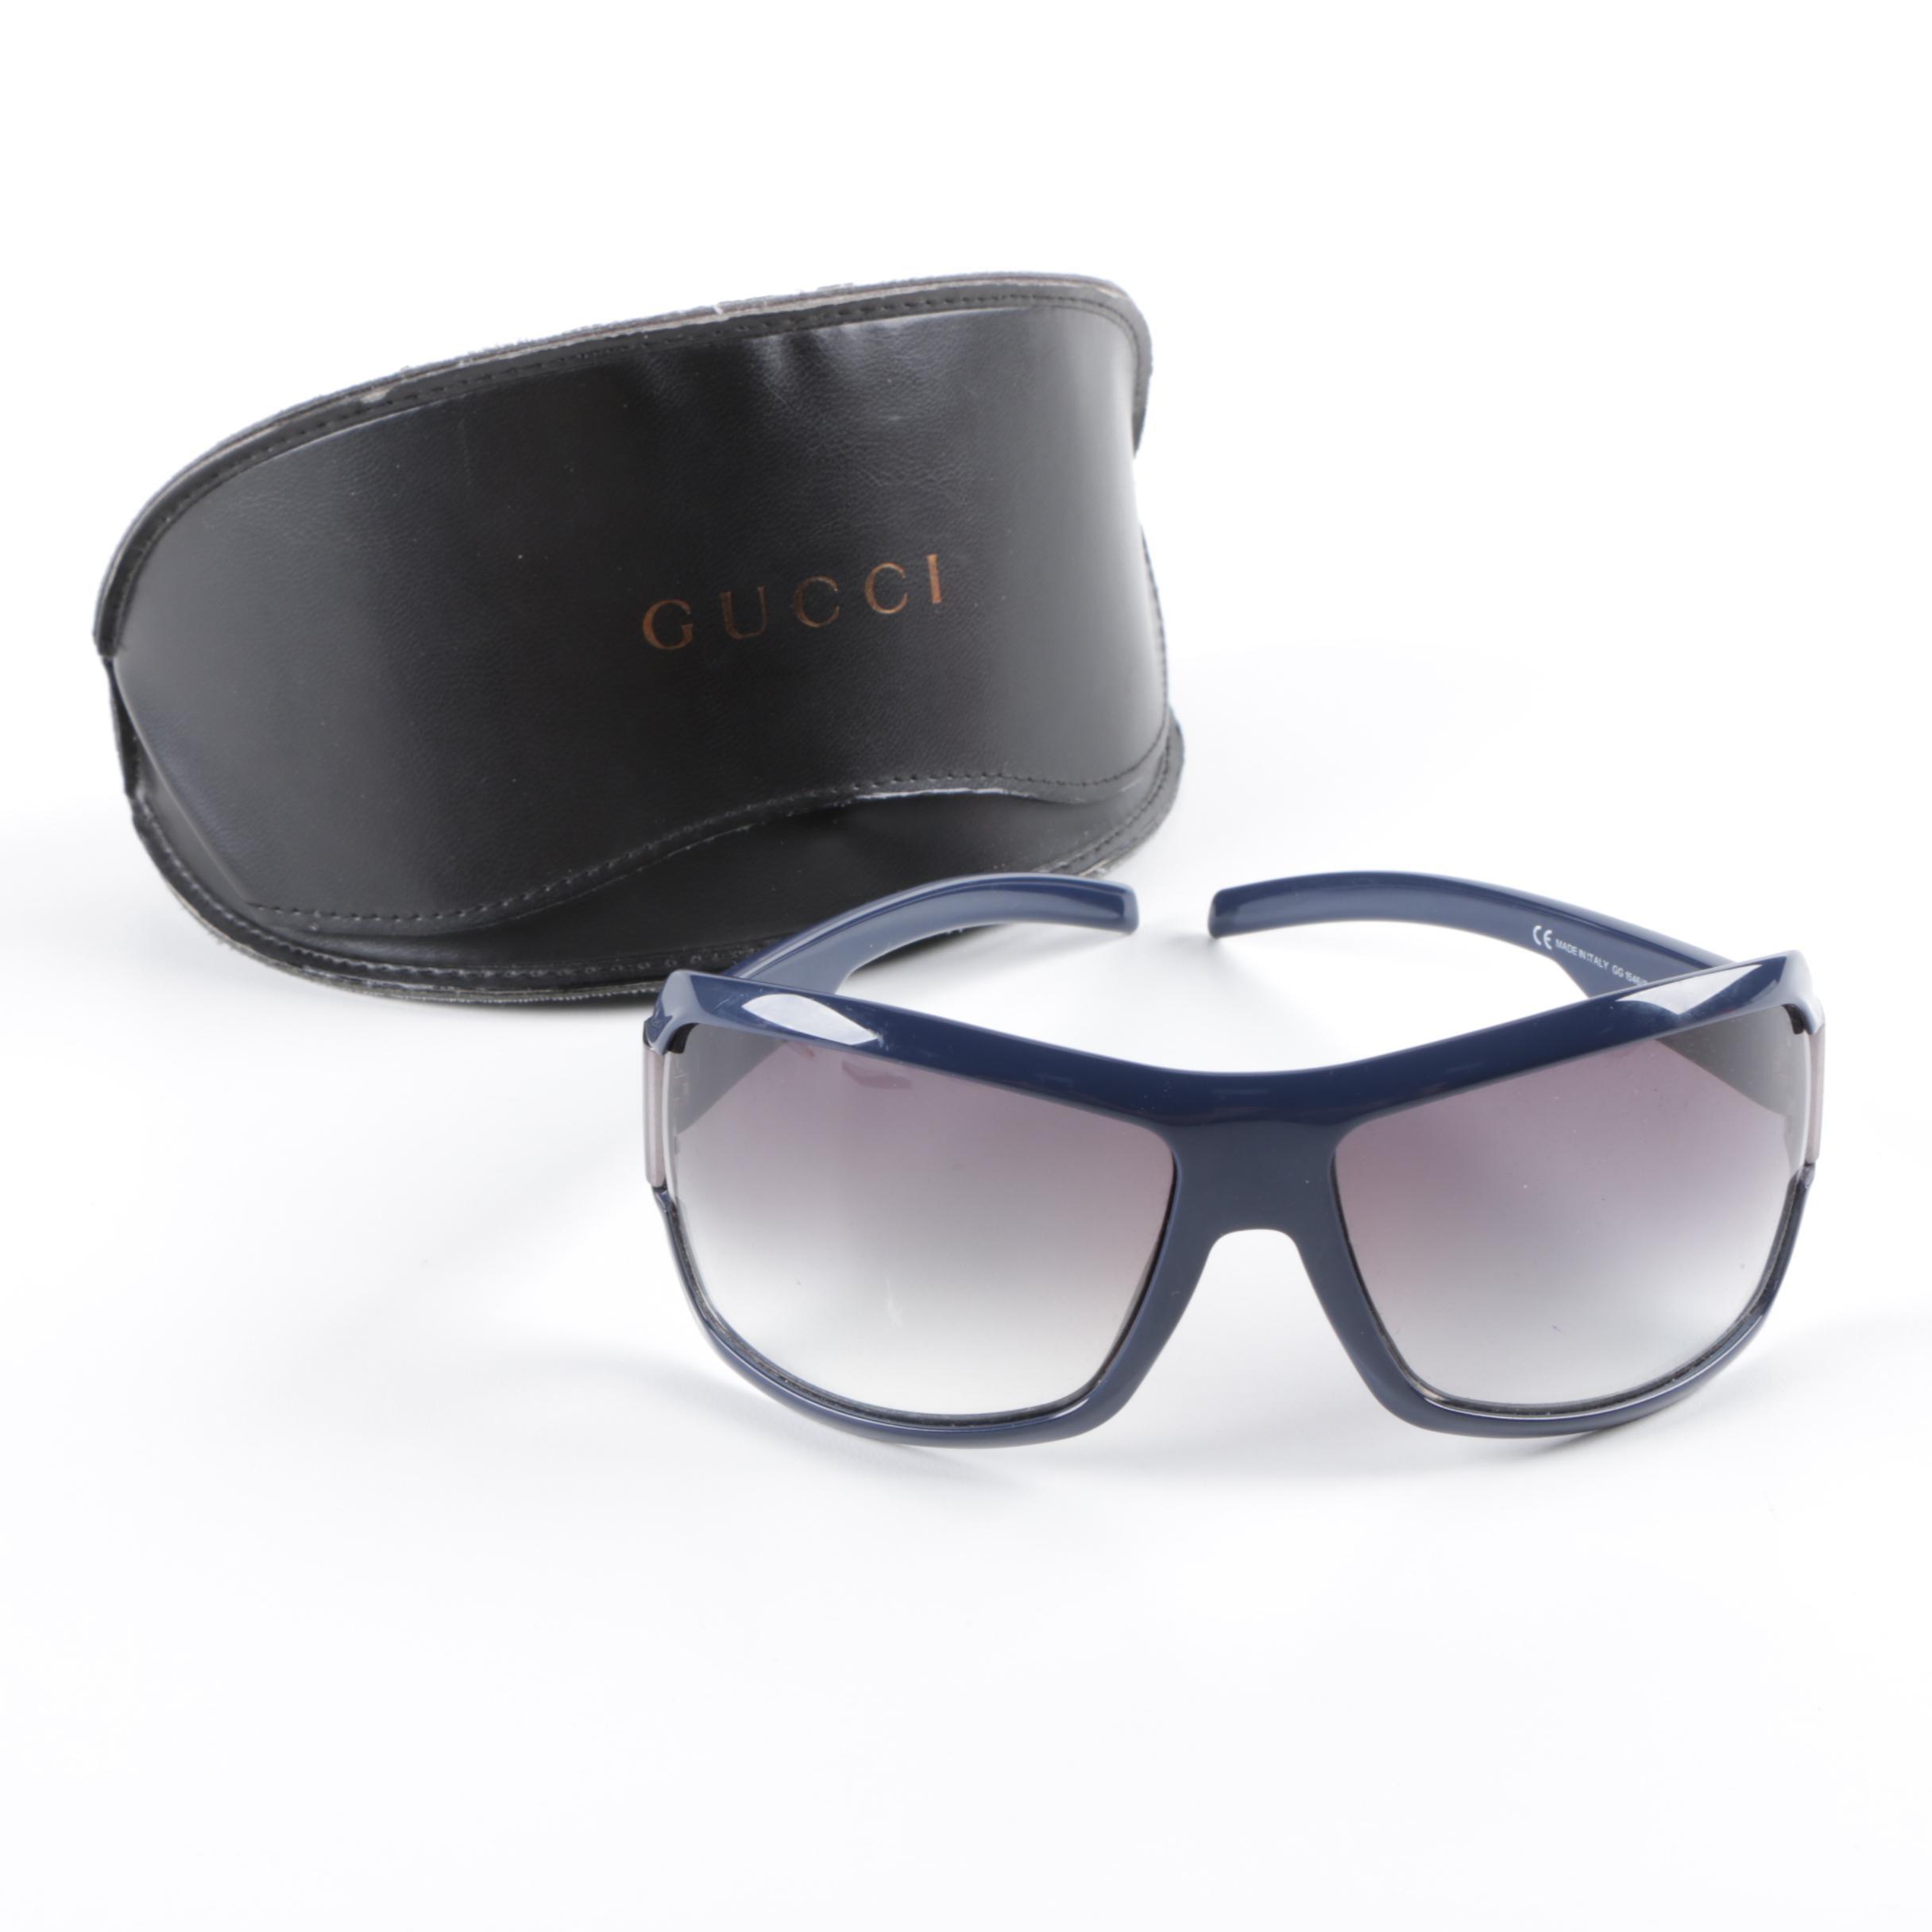 Gucci GG 1546/S Blue Wrap Sunglasses with Case